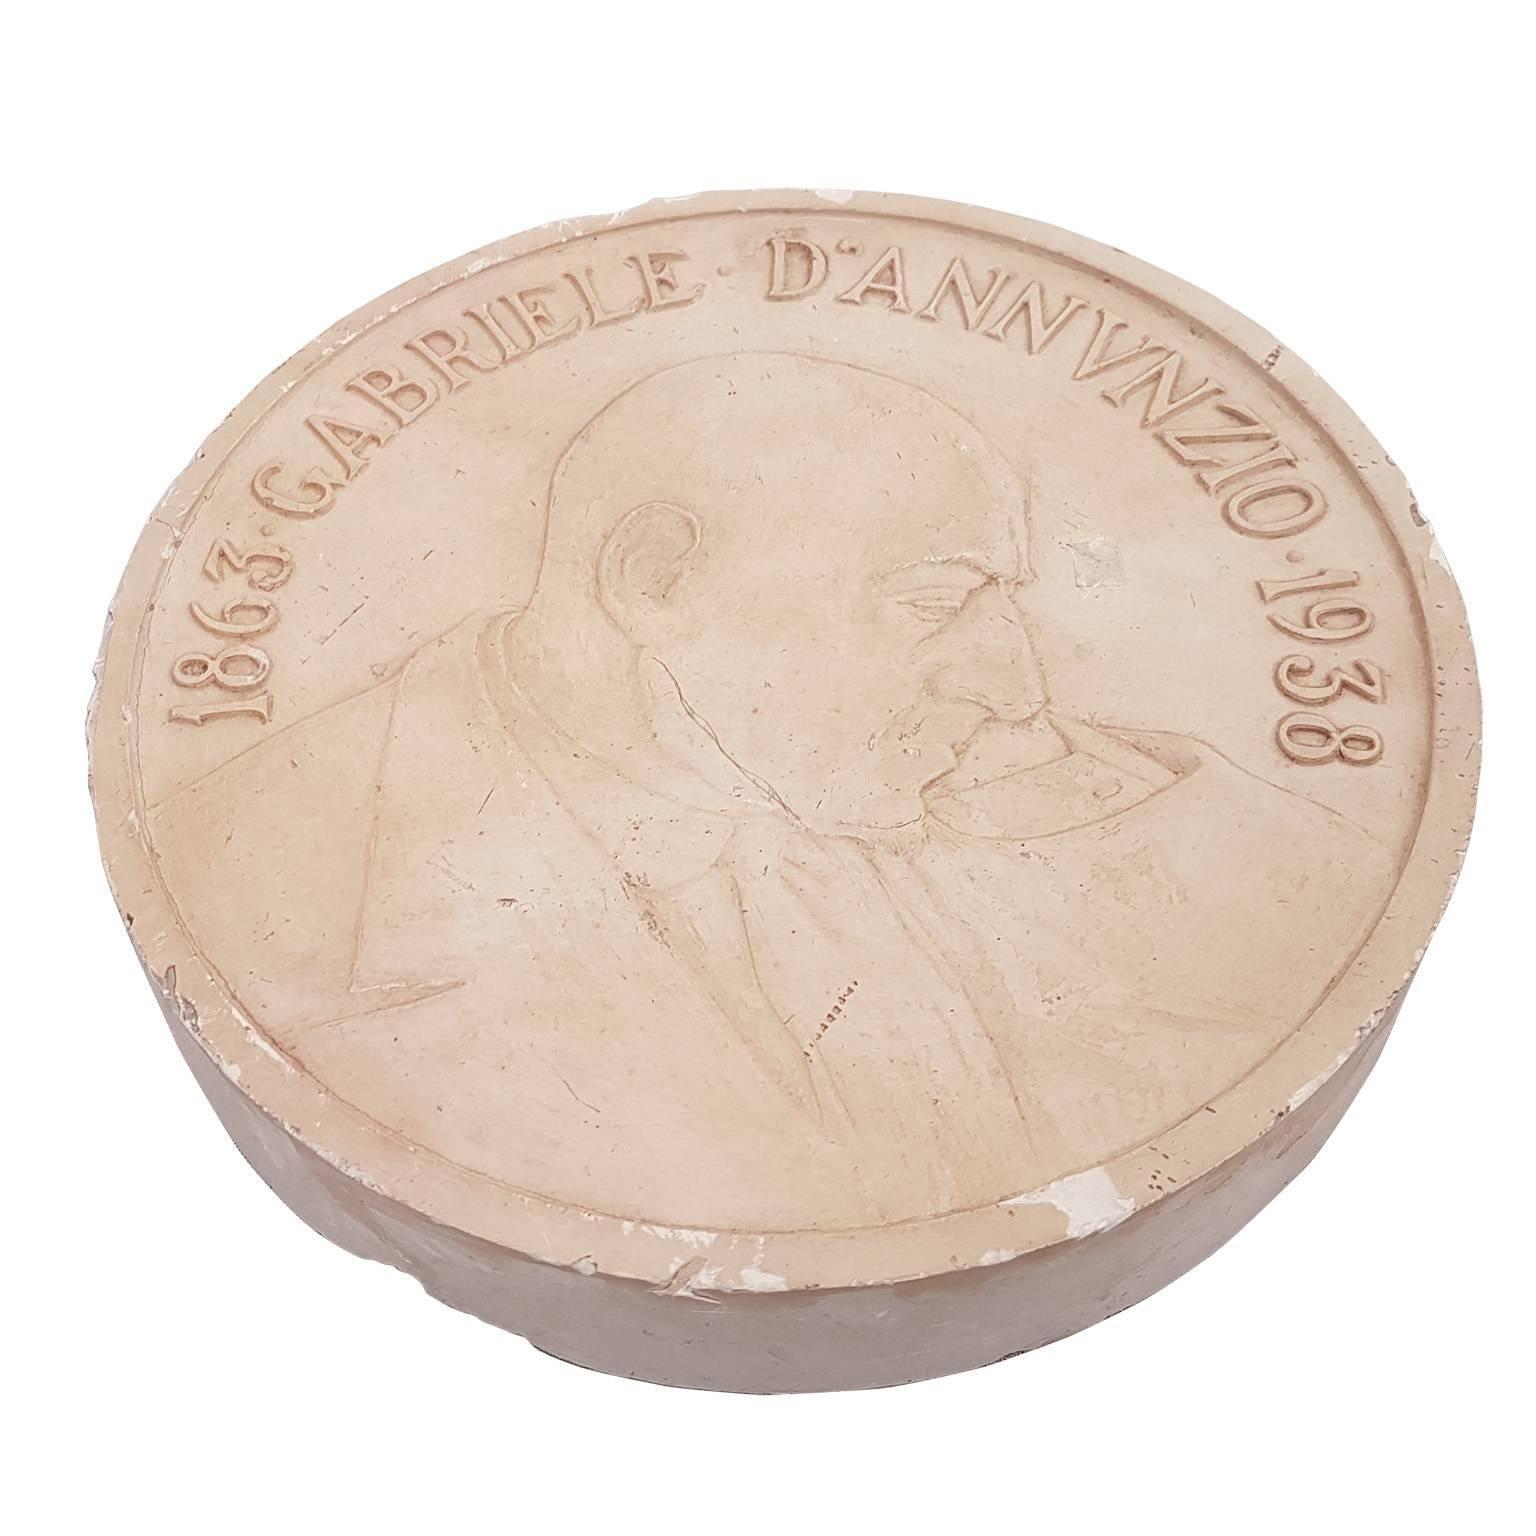 Bronze Cast Representing Gabriele D'Annunzio by Mistruzzi, 20th Century